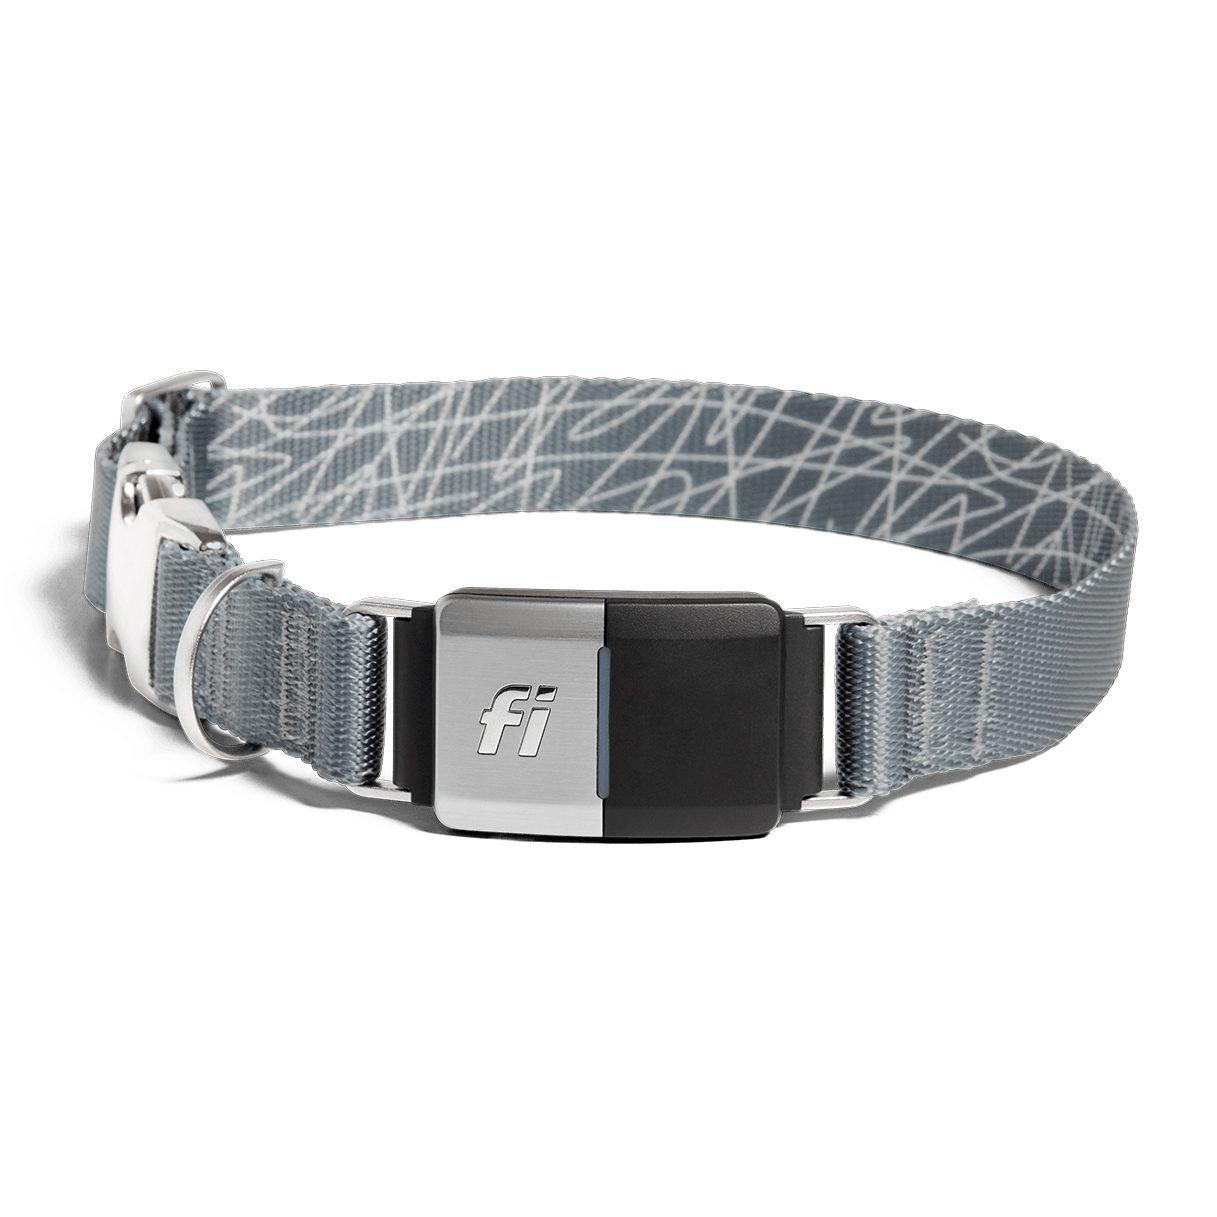 tracker collar